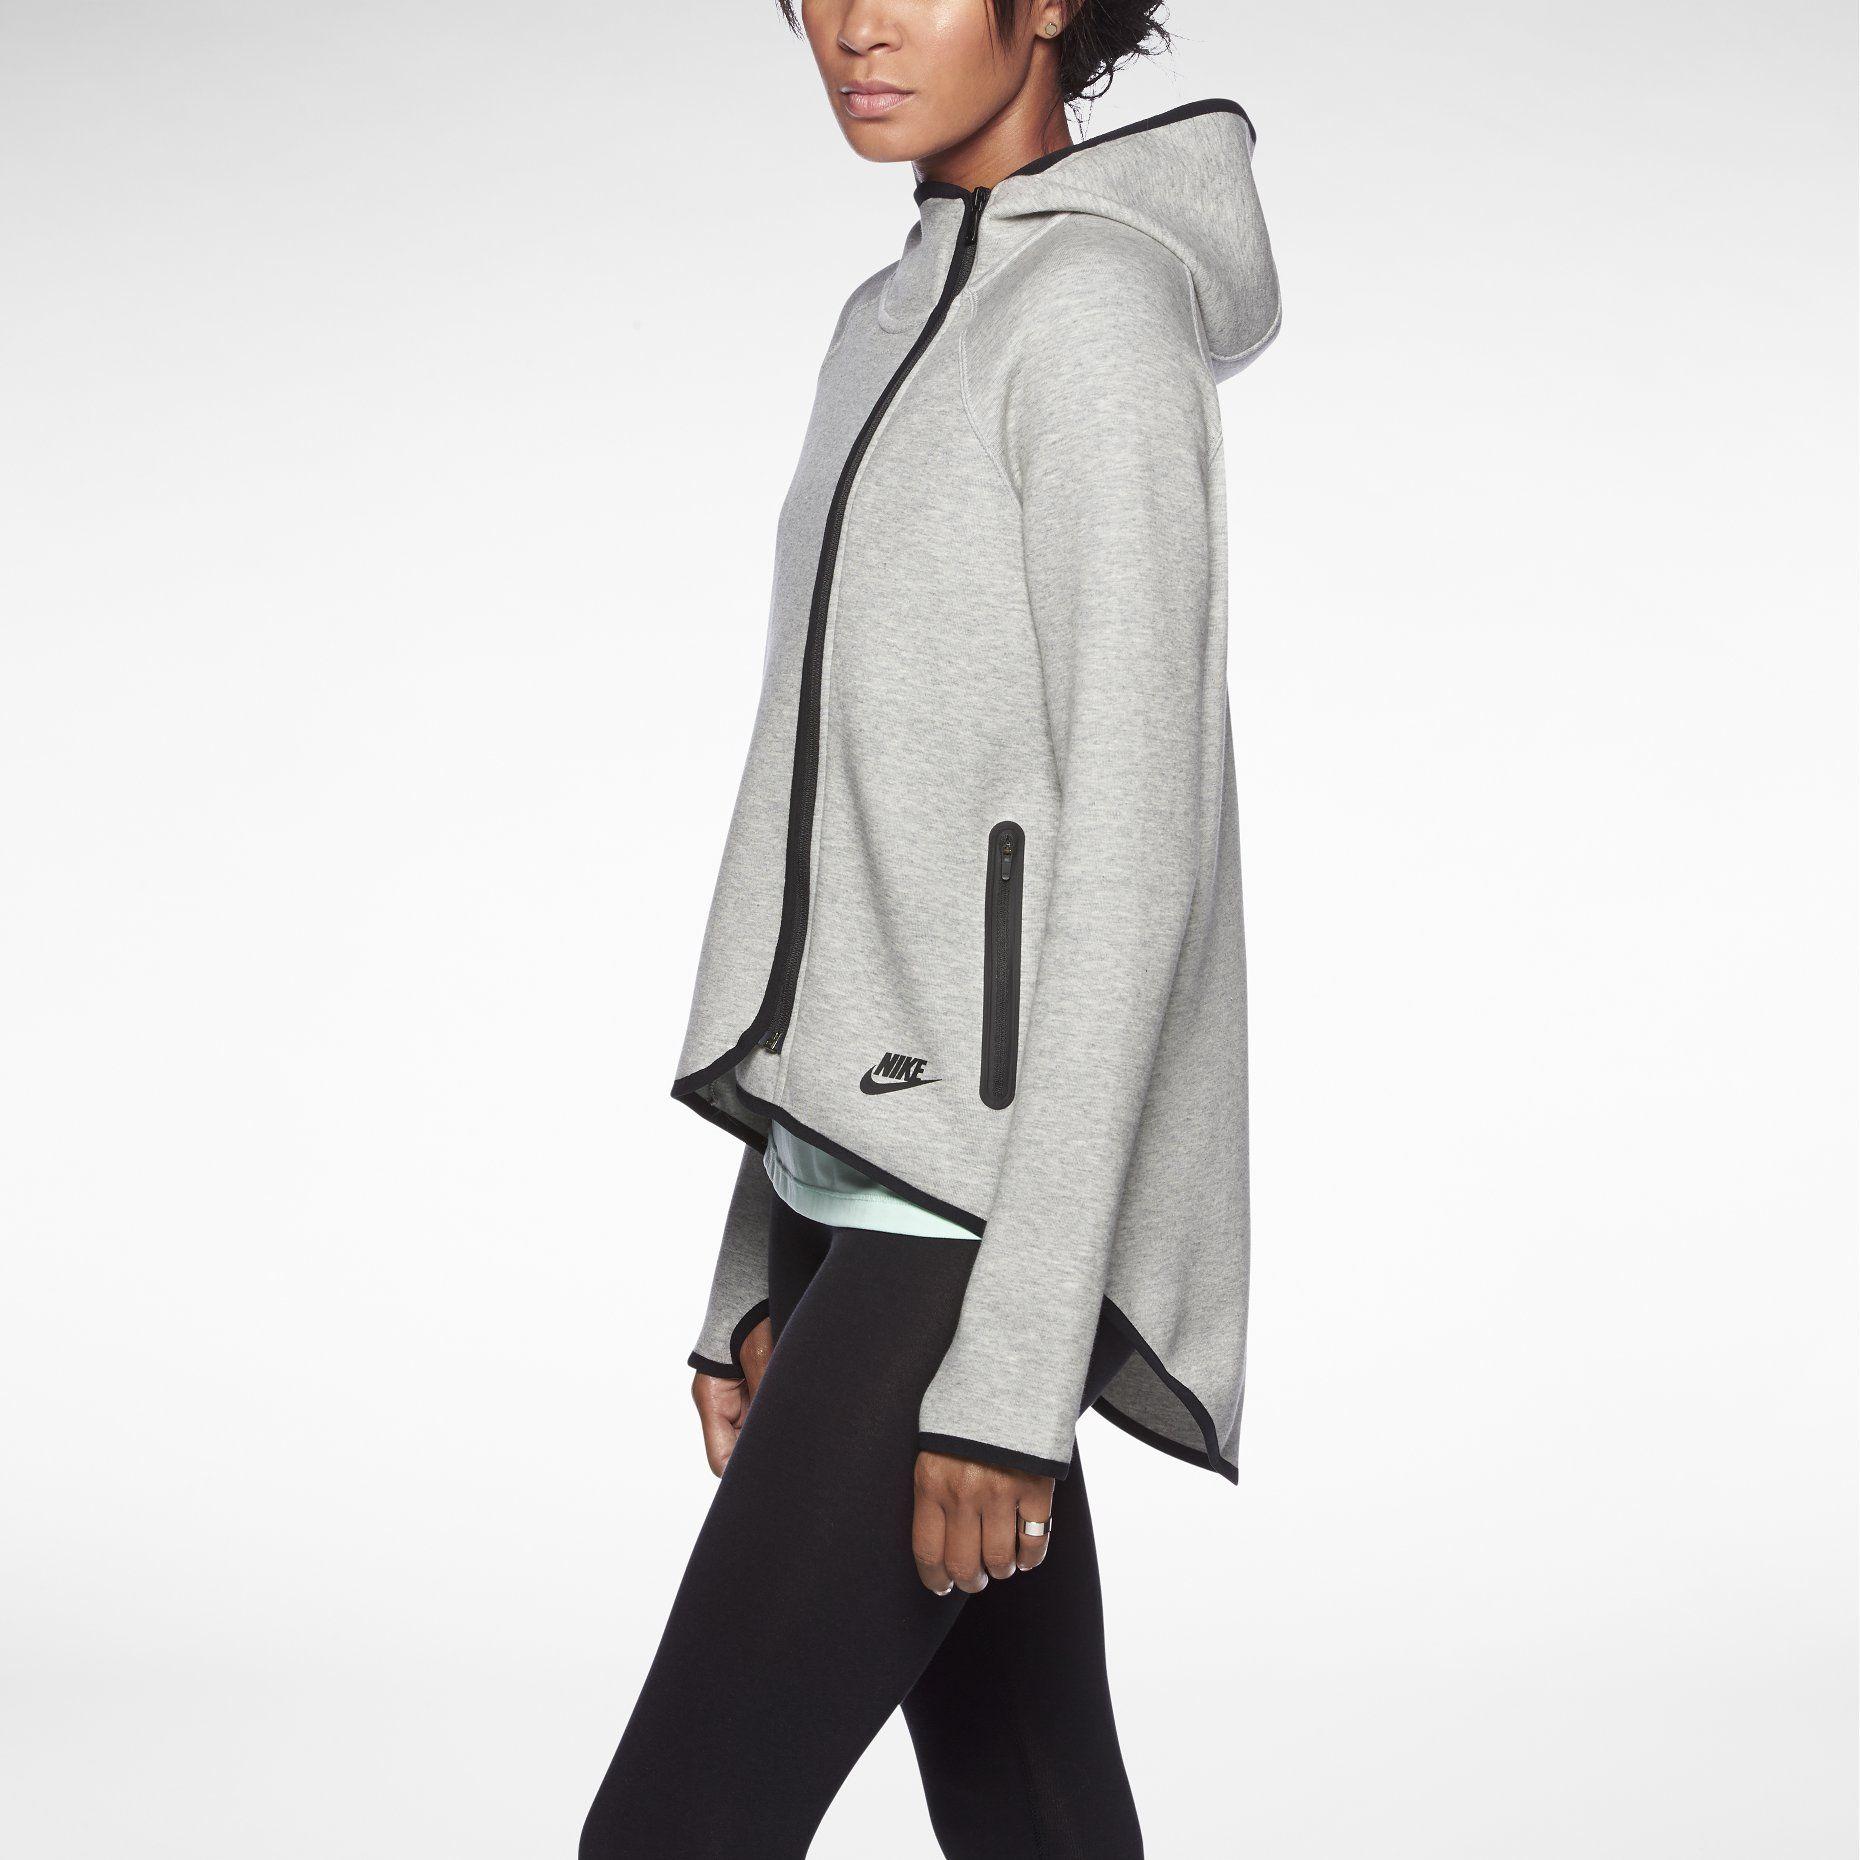 Nike Store Nike Tech Fleece Cape Women S Hoodie Nike Tech Fleece Fashion Trendy Tops [ 1860 x 1860 Pixel ]